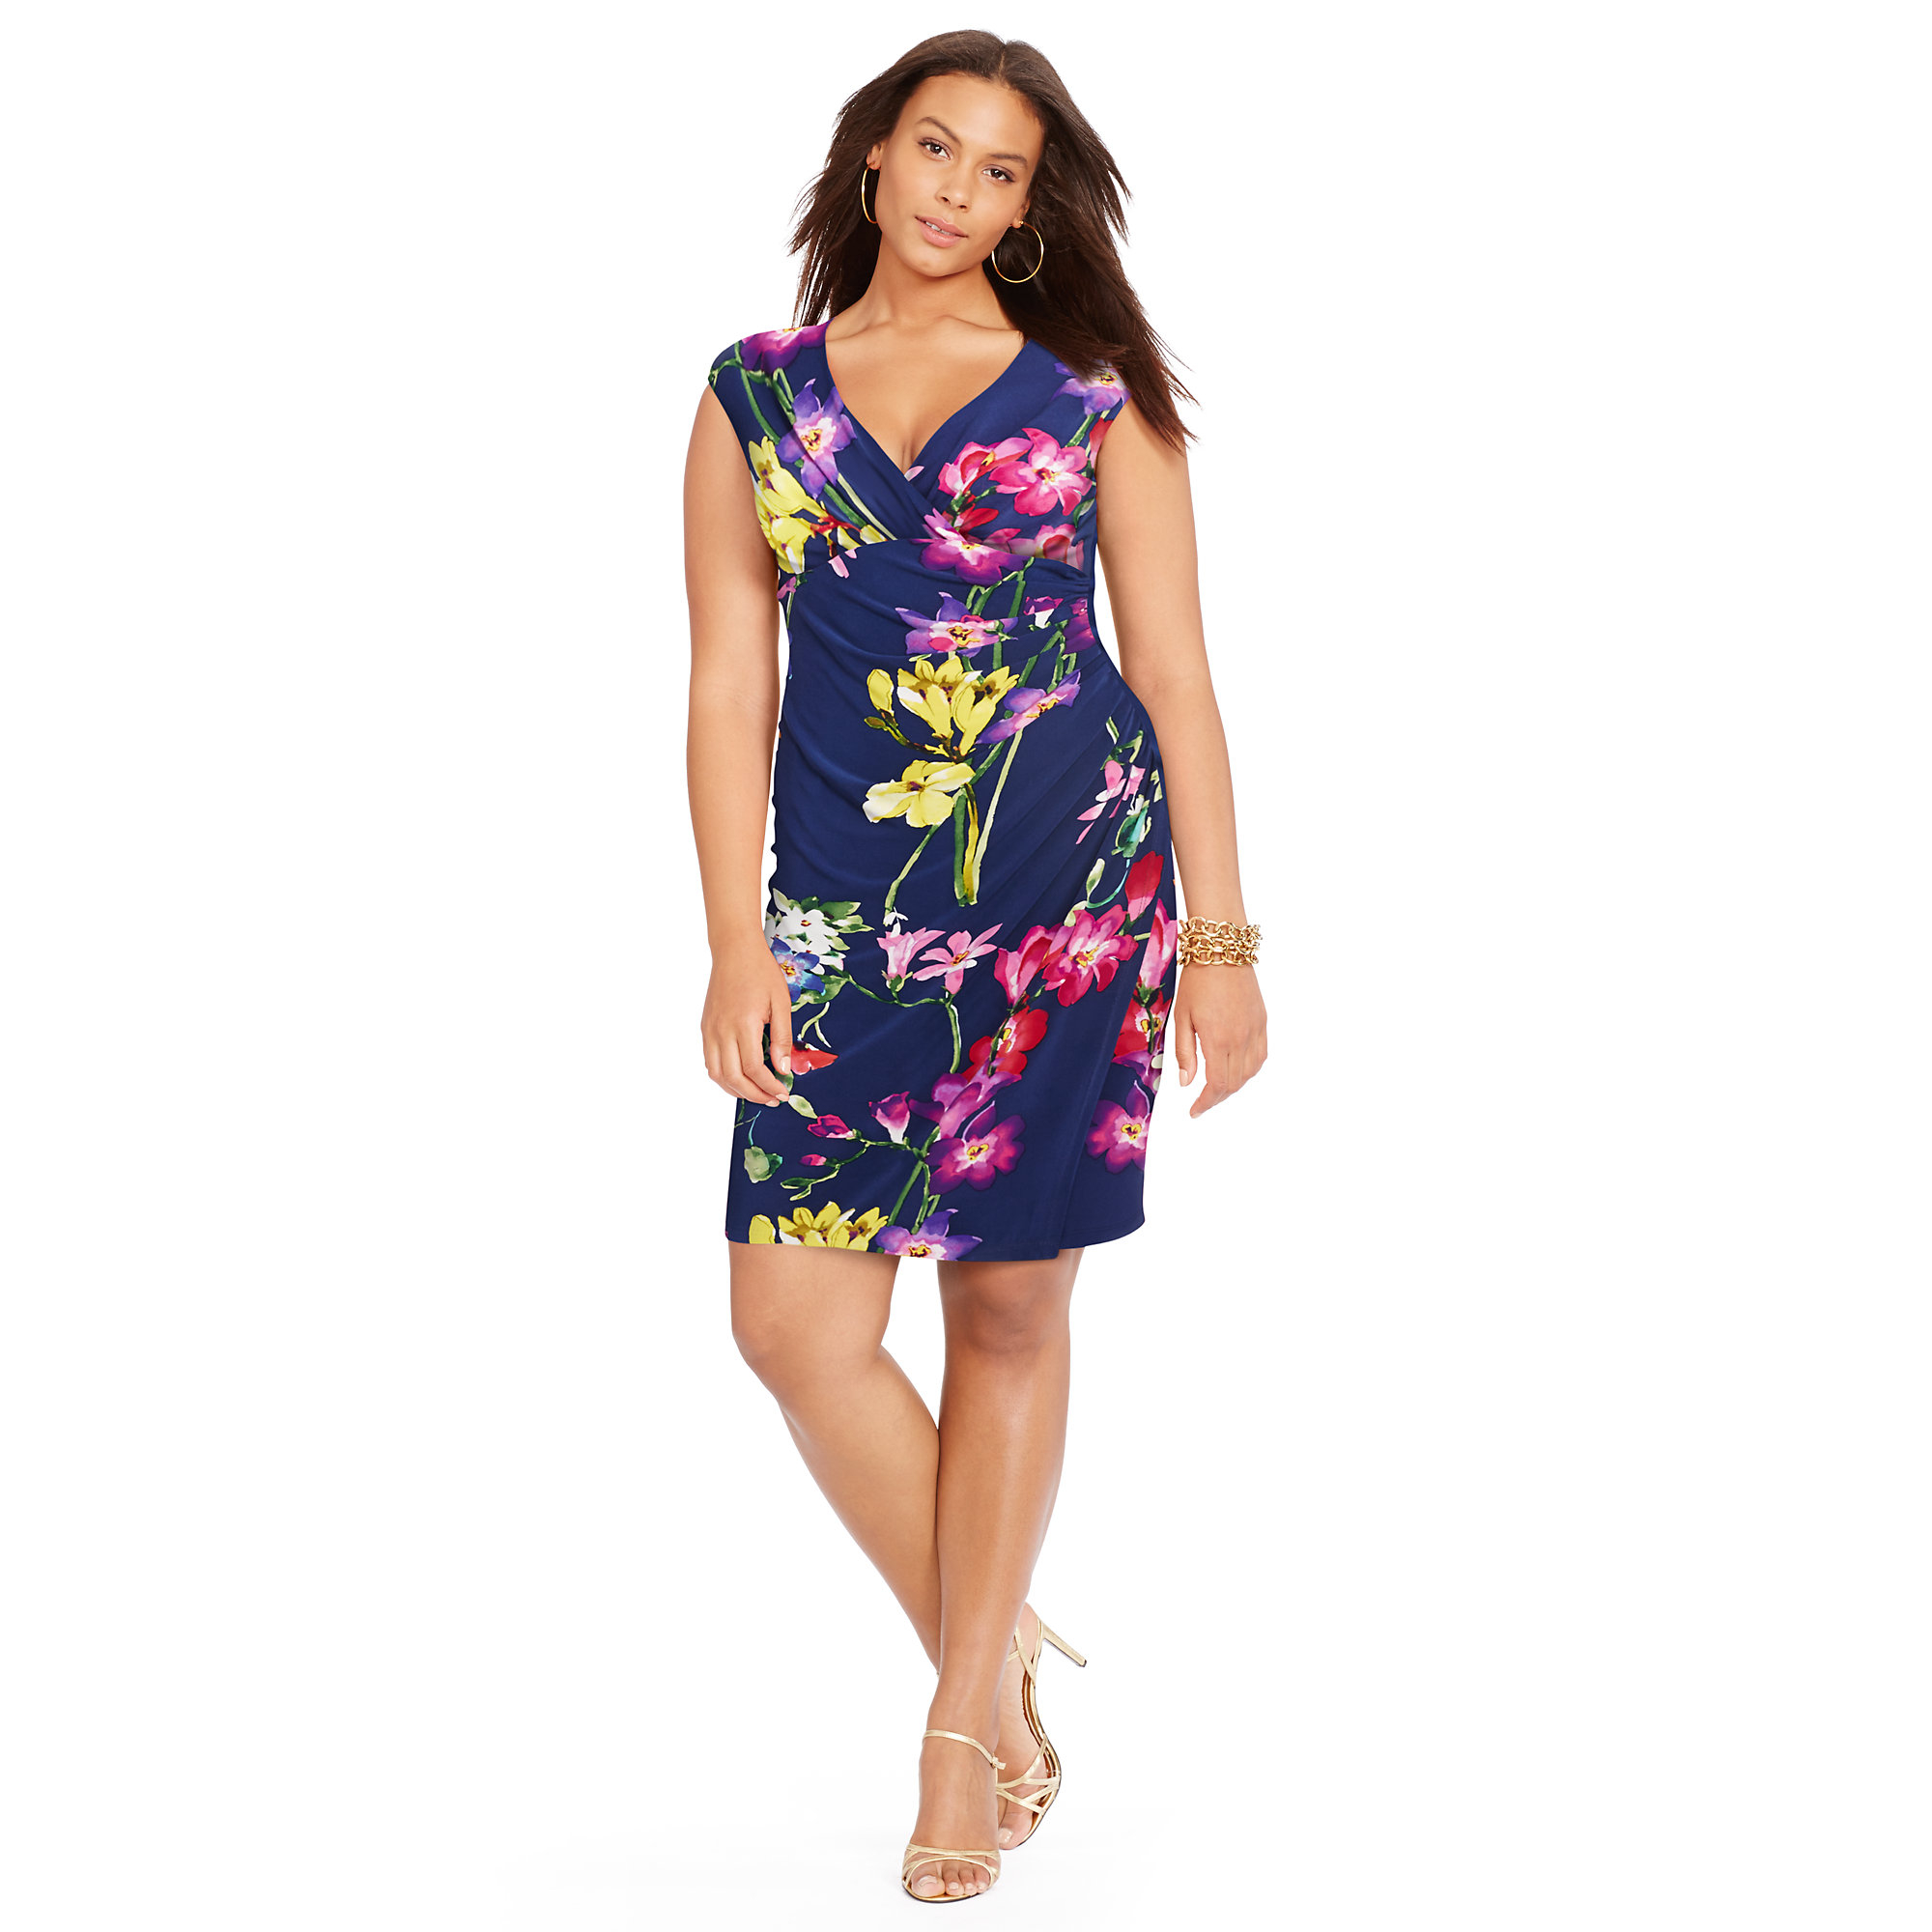 Ralph lauren Floral Wrap Dress in Blue - Lyst